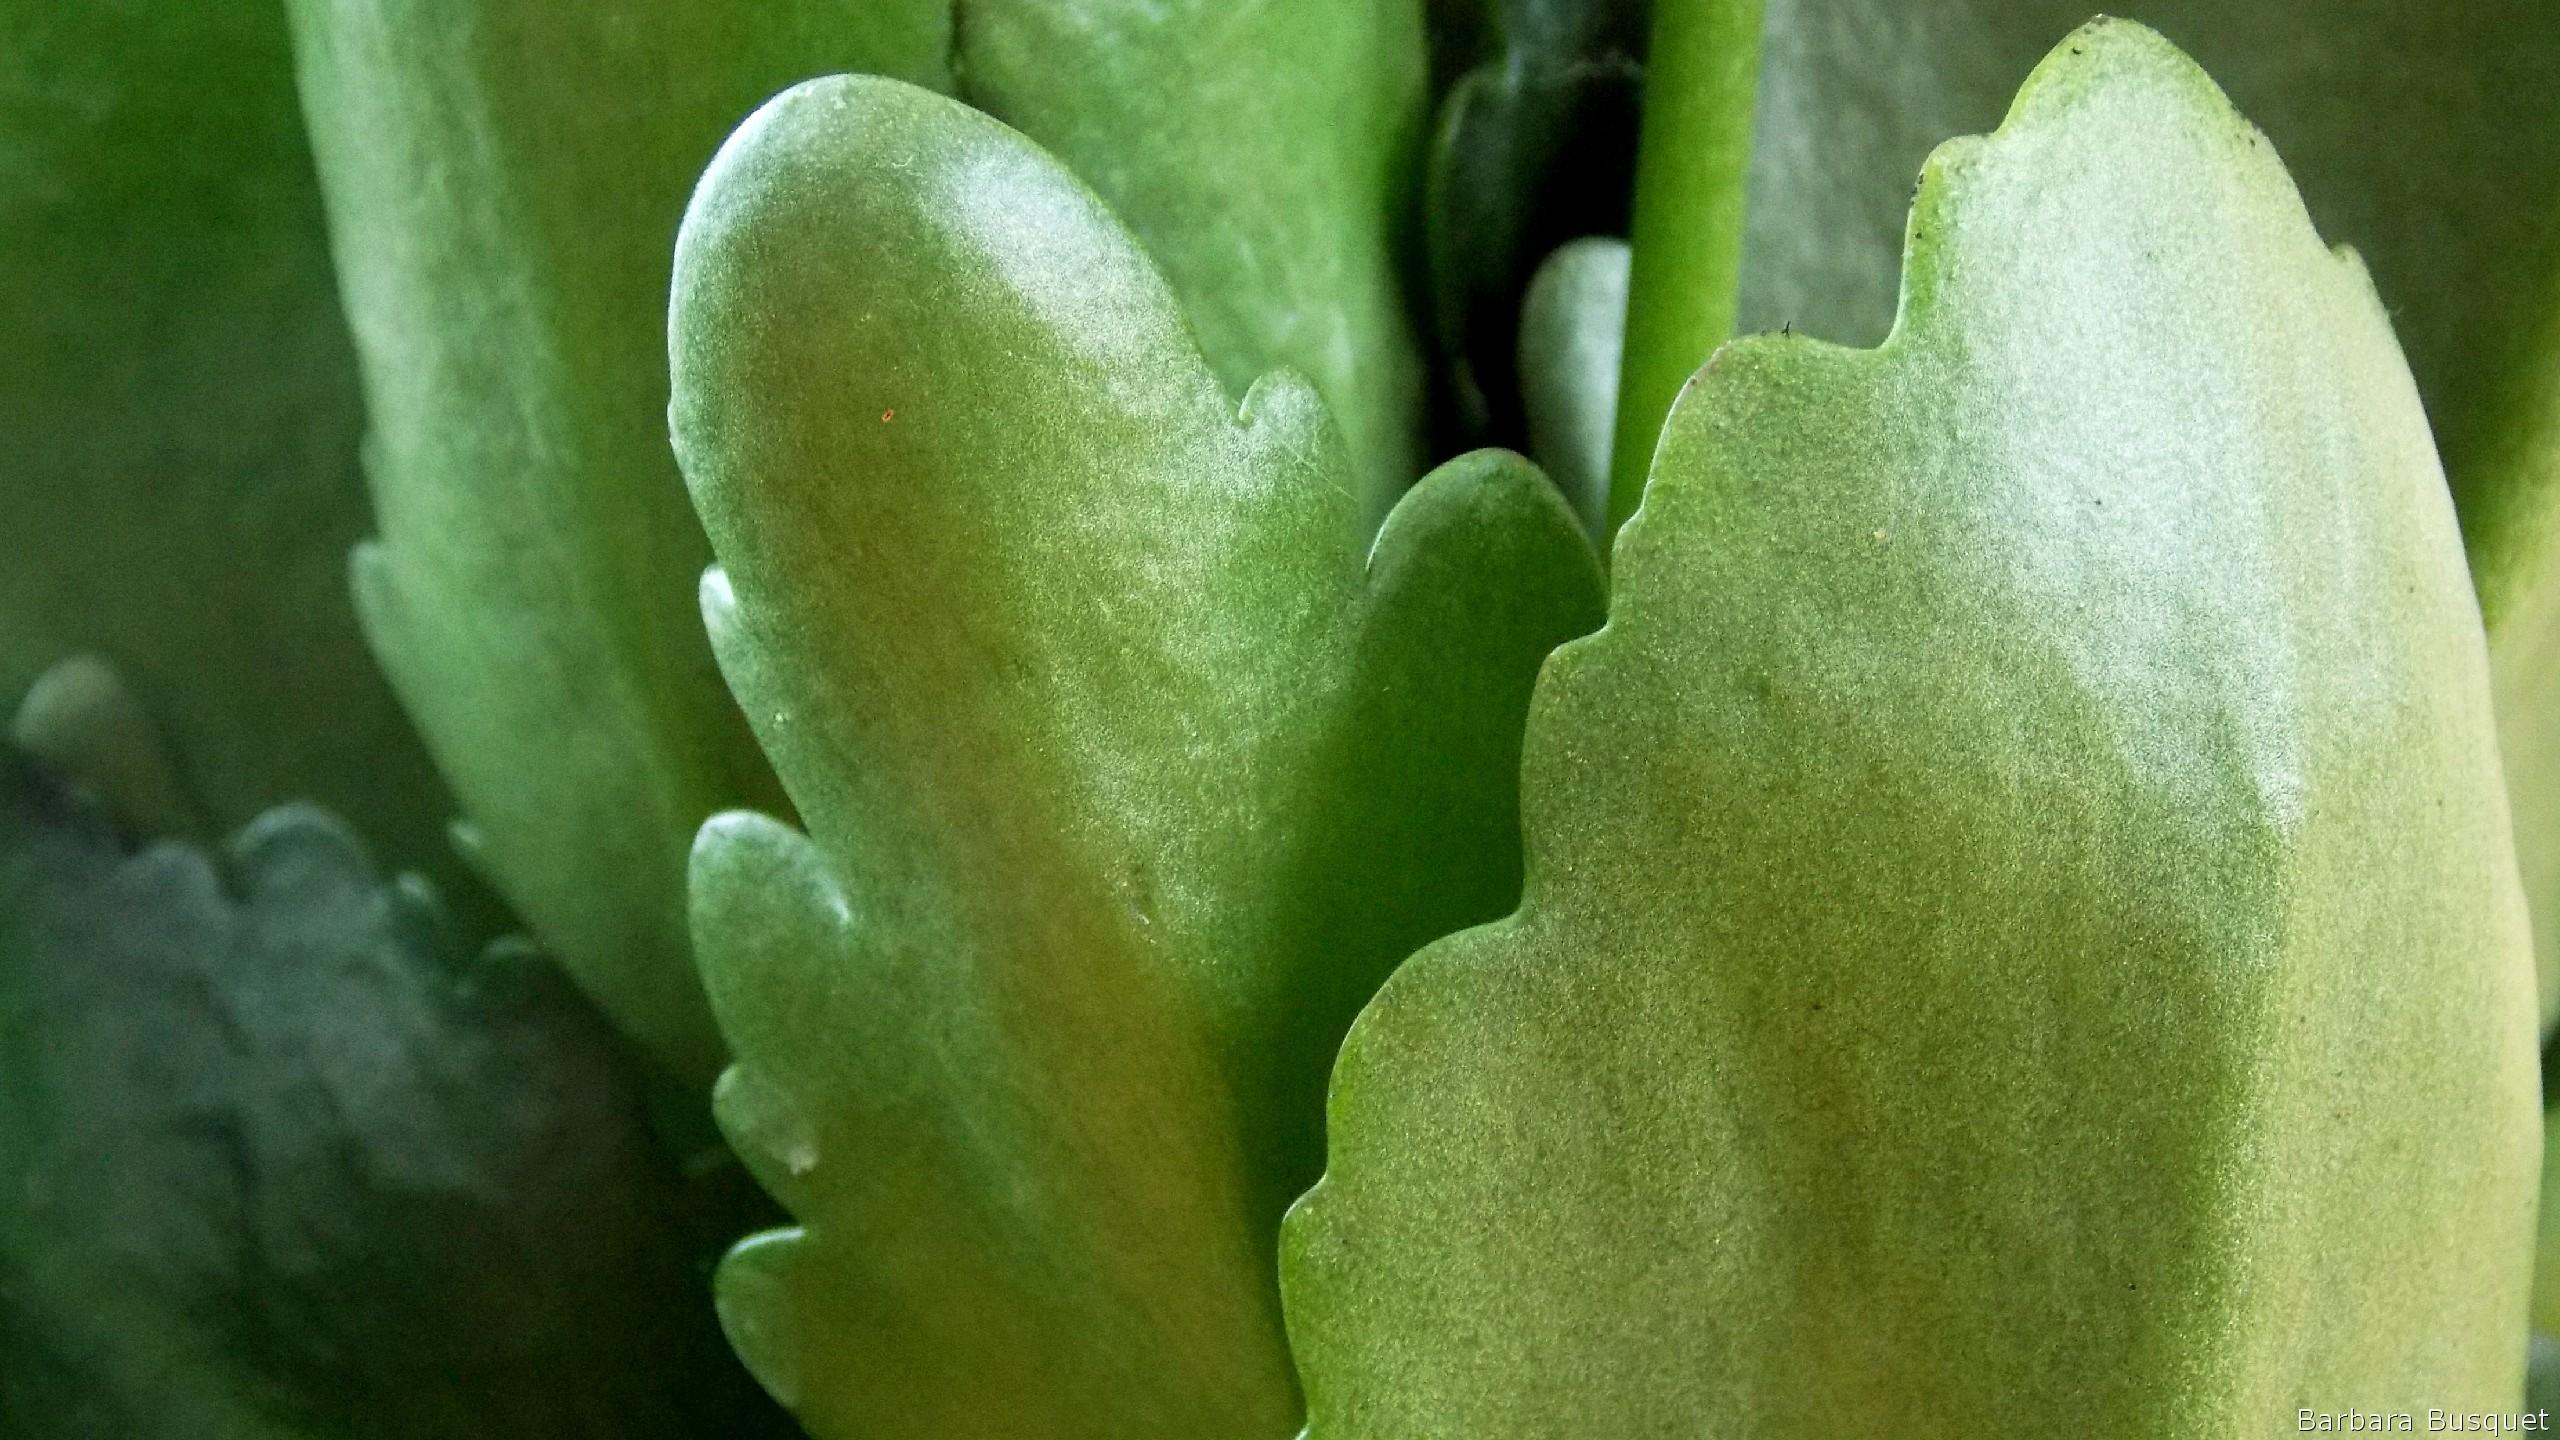 sedum plant hd wallpaper - photo #3